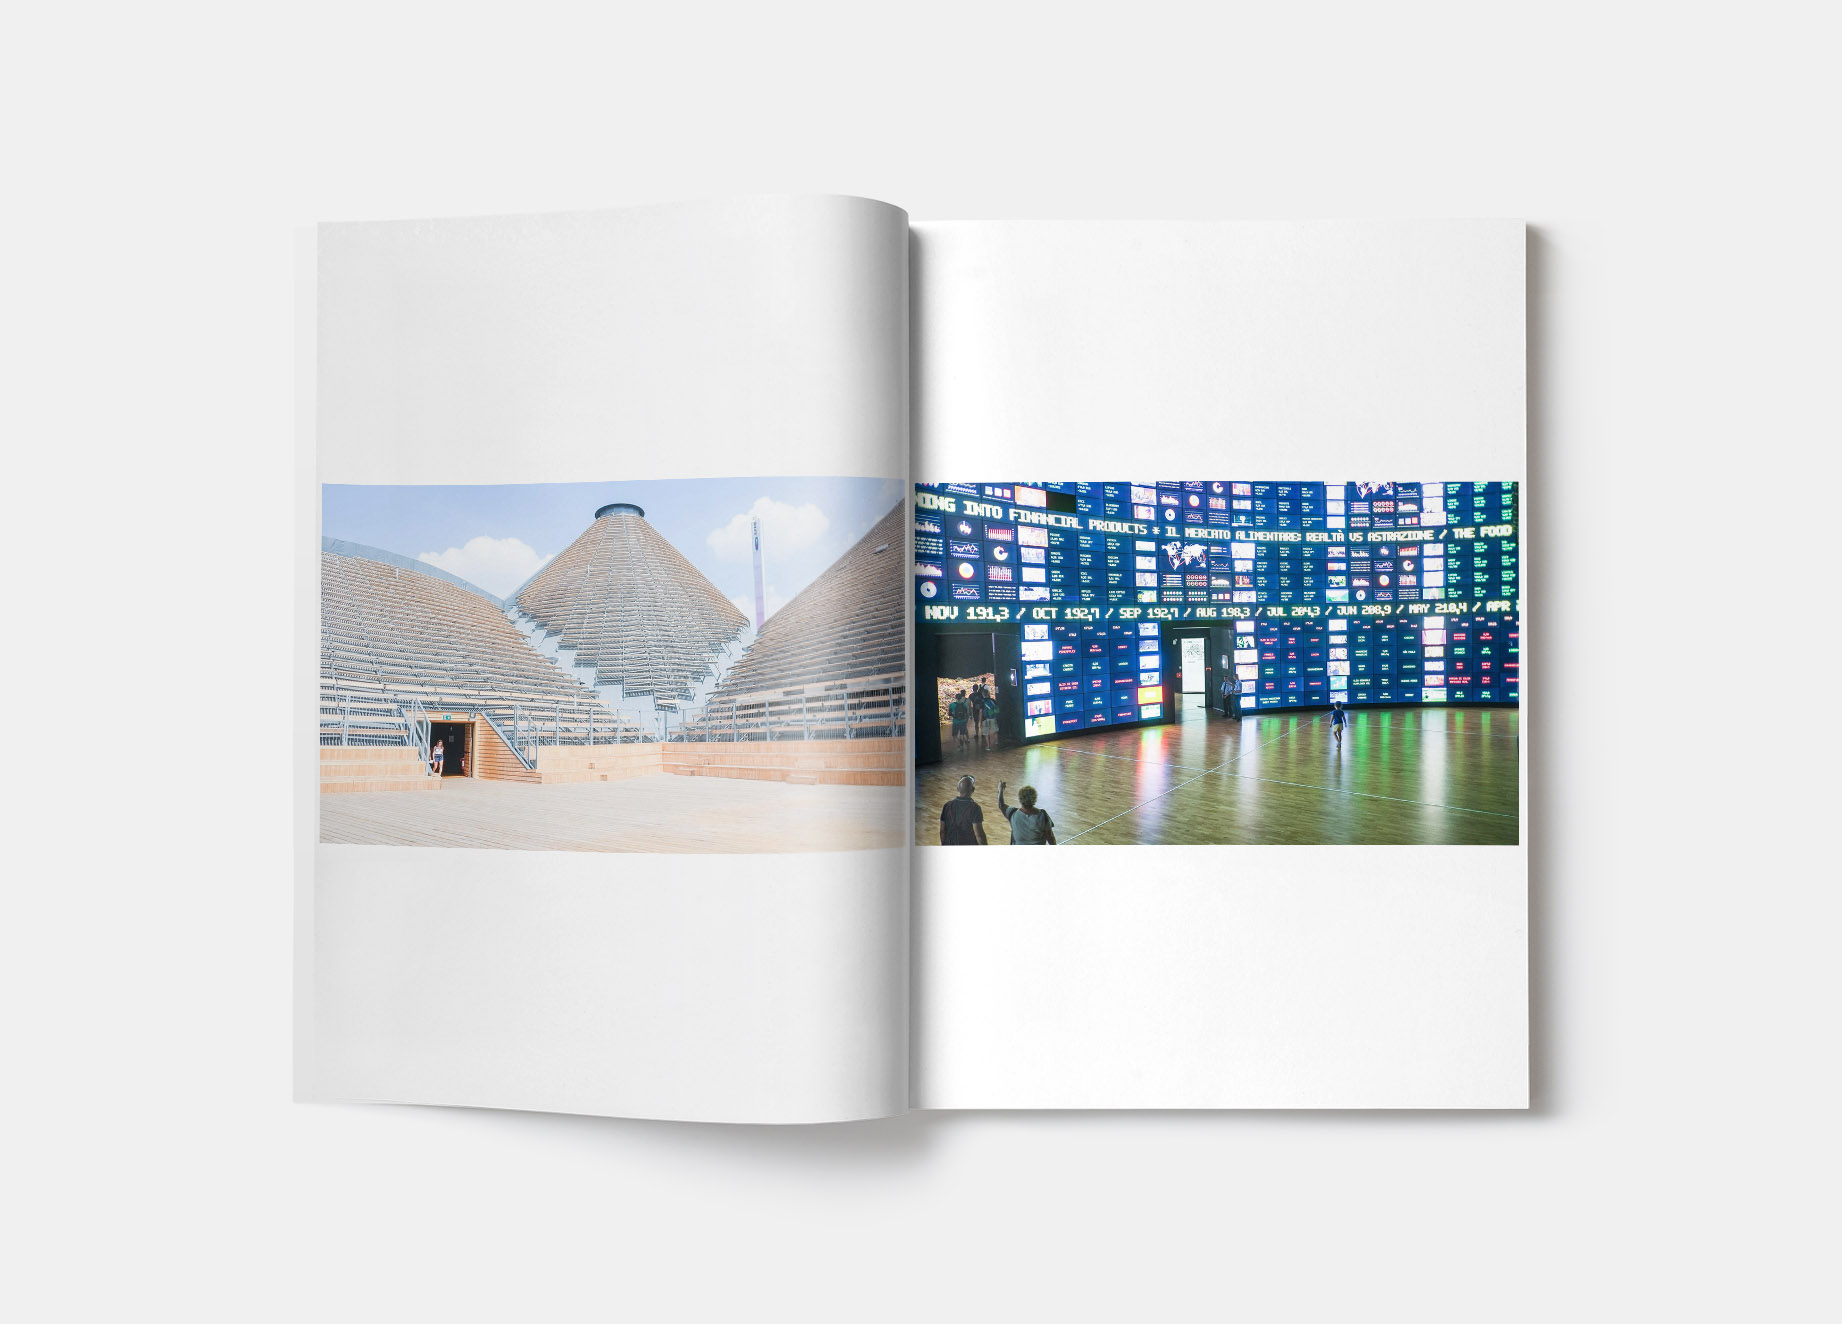 Photos de l'exposition universelle de Milan en 2015, création de contenu, Sakkamoto agence de création de contenu de marque.